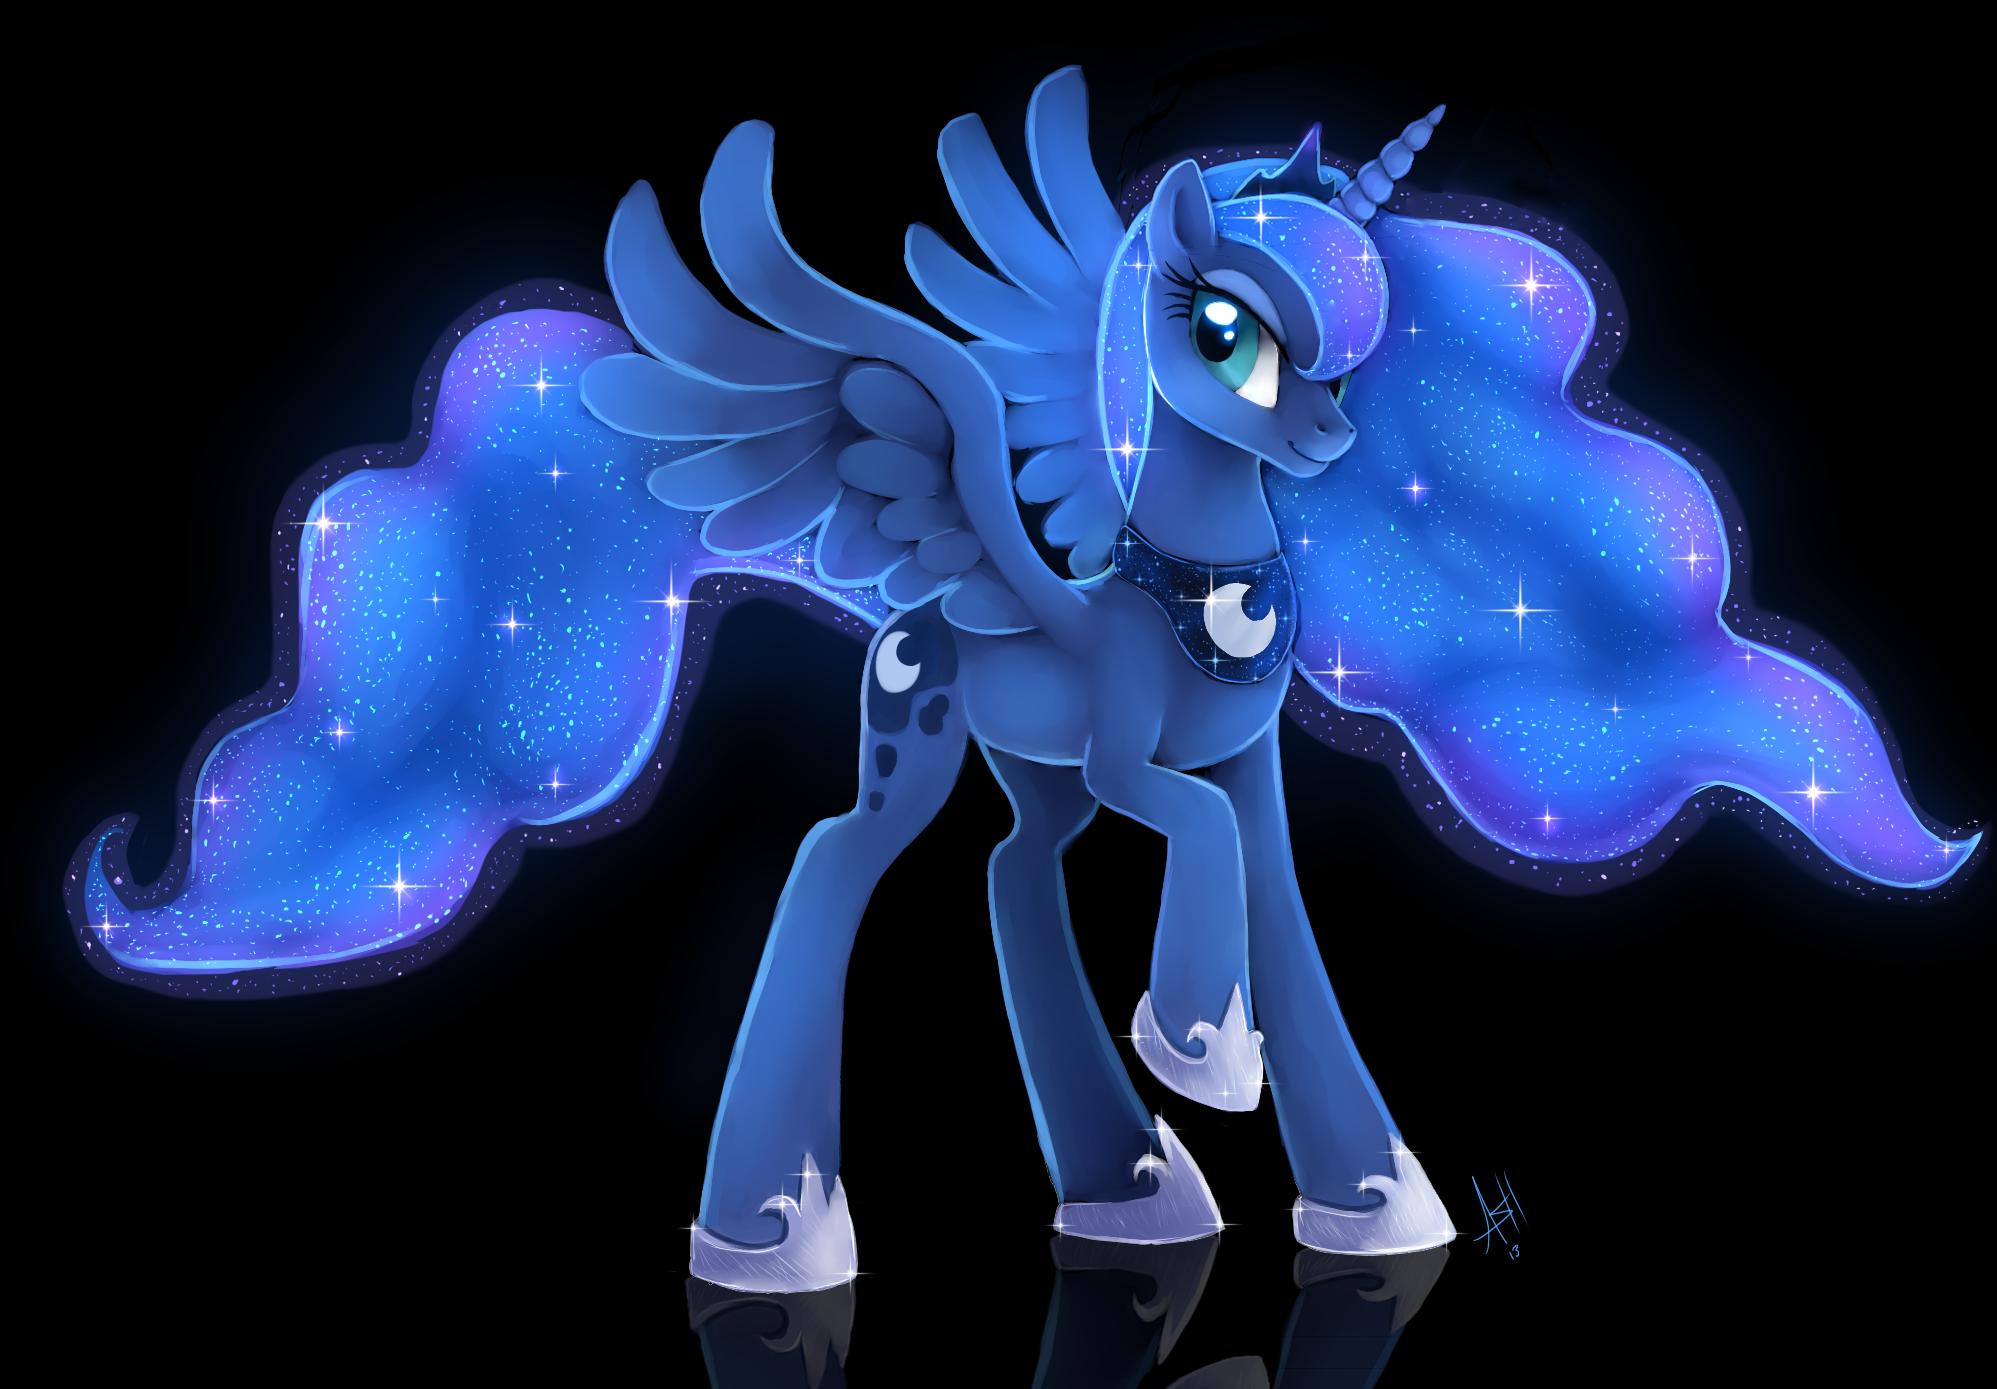 Luna by Skeleion